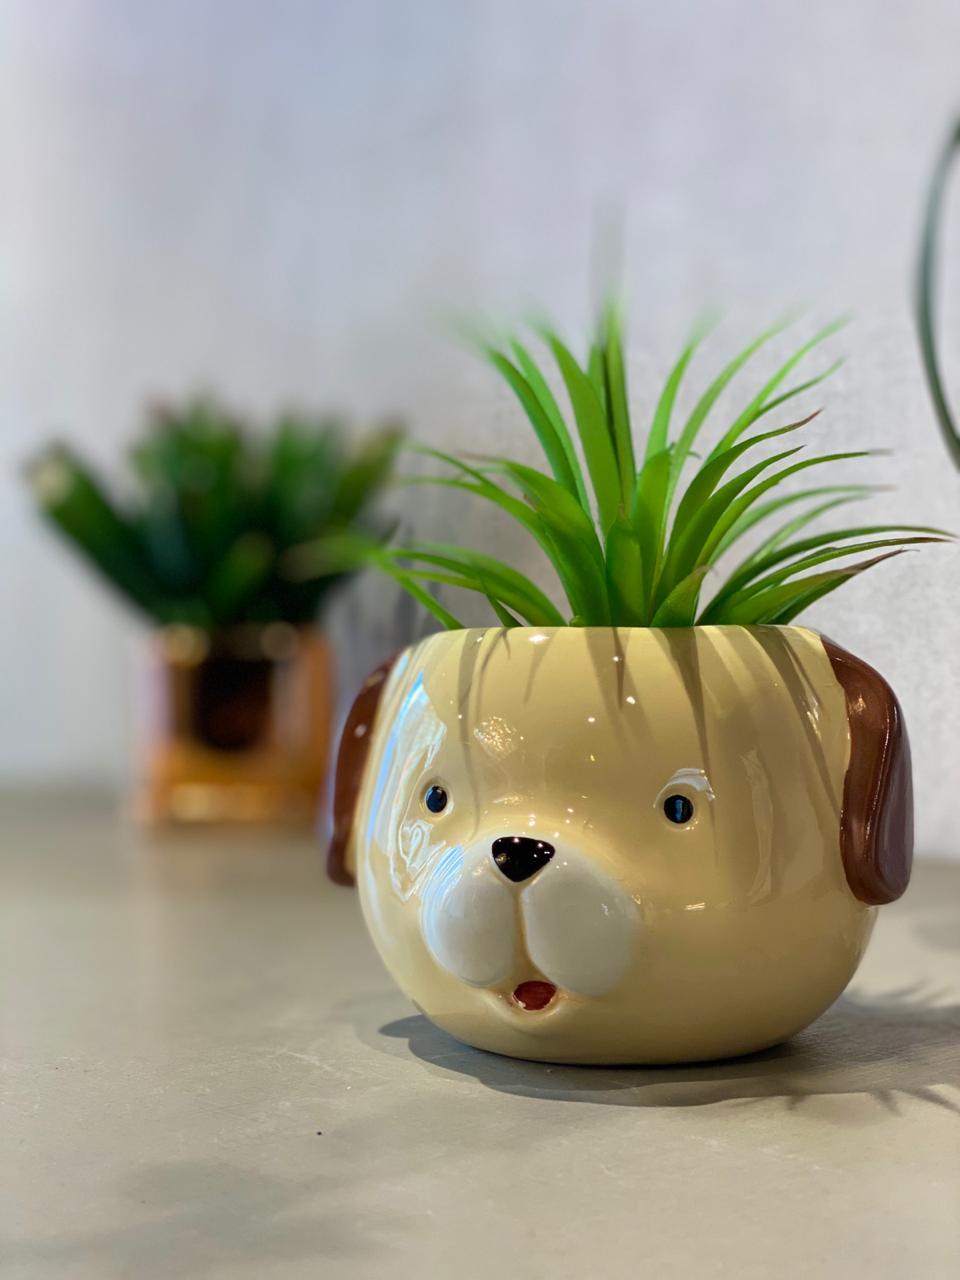 Vaso Decorativo Pets Colection: Cachorro - La Fleur